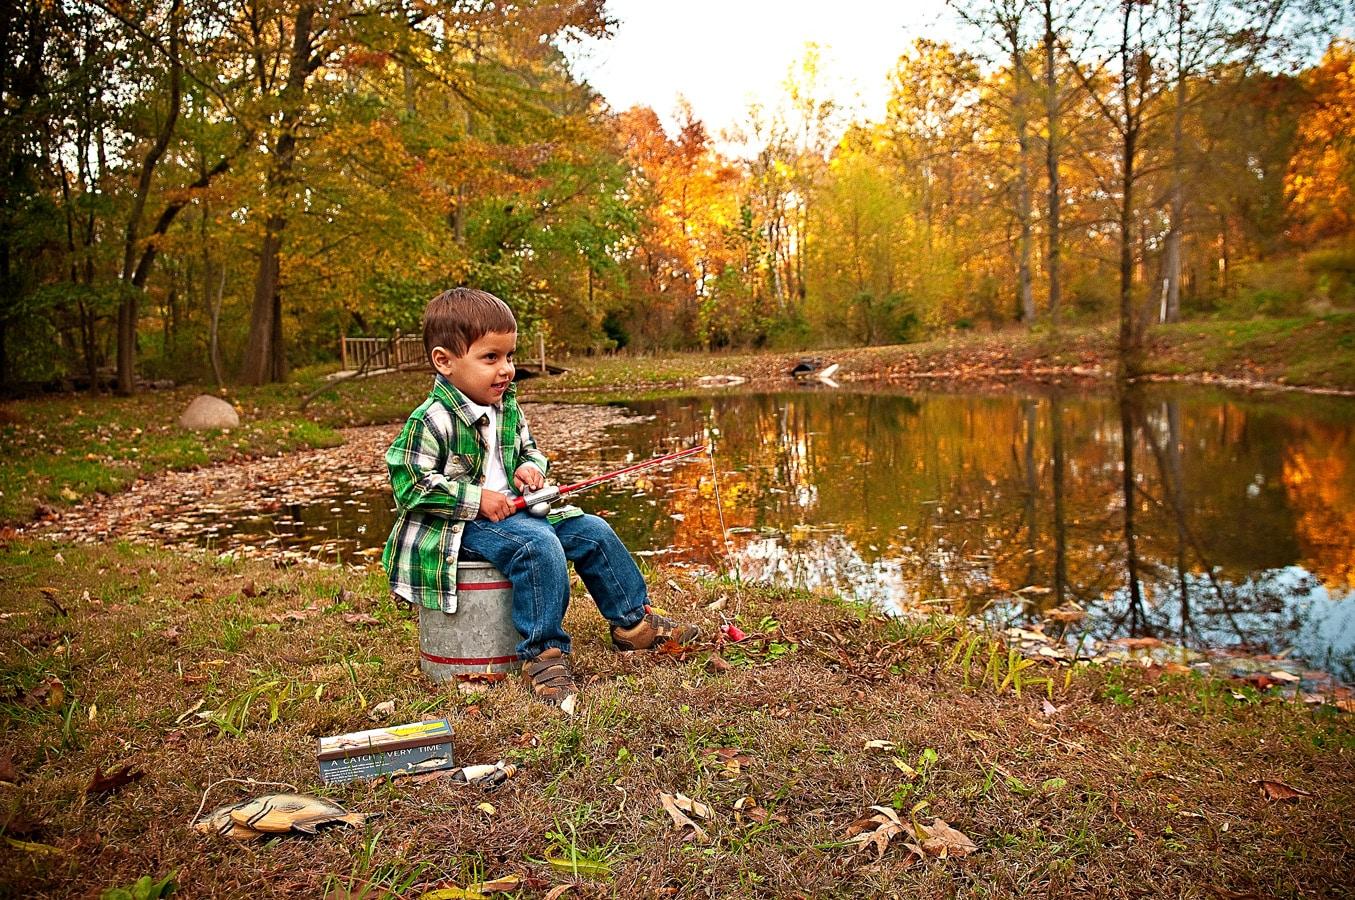 child, portrait, outdoor, pond, natural light, Northern VA